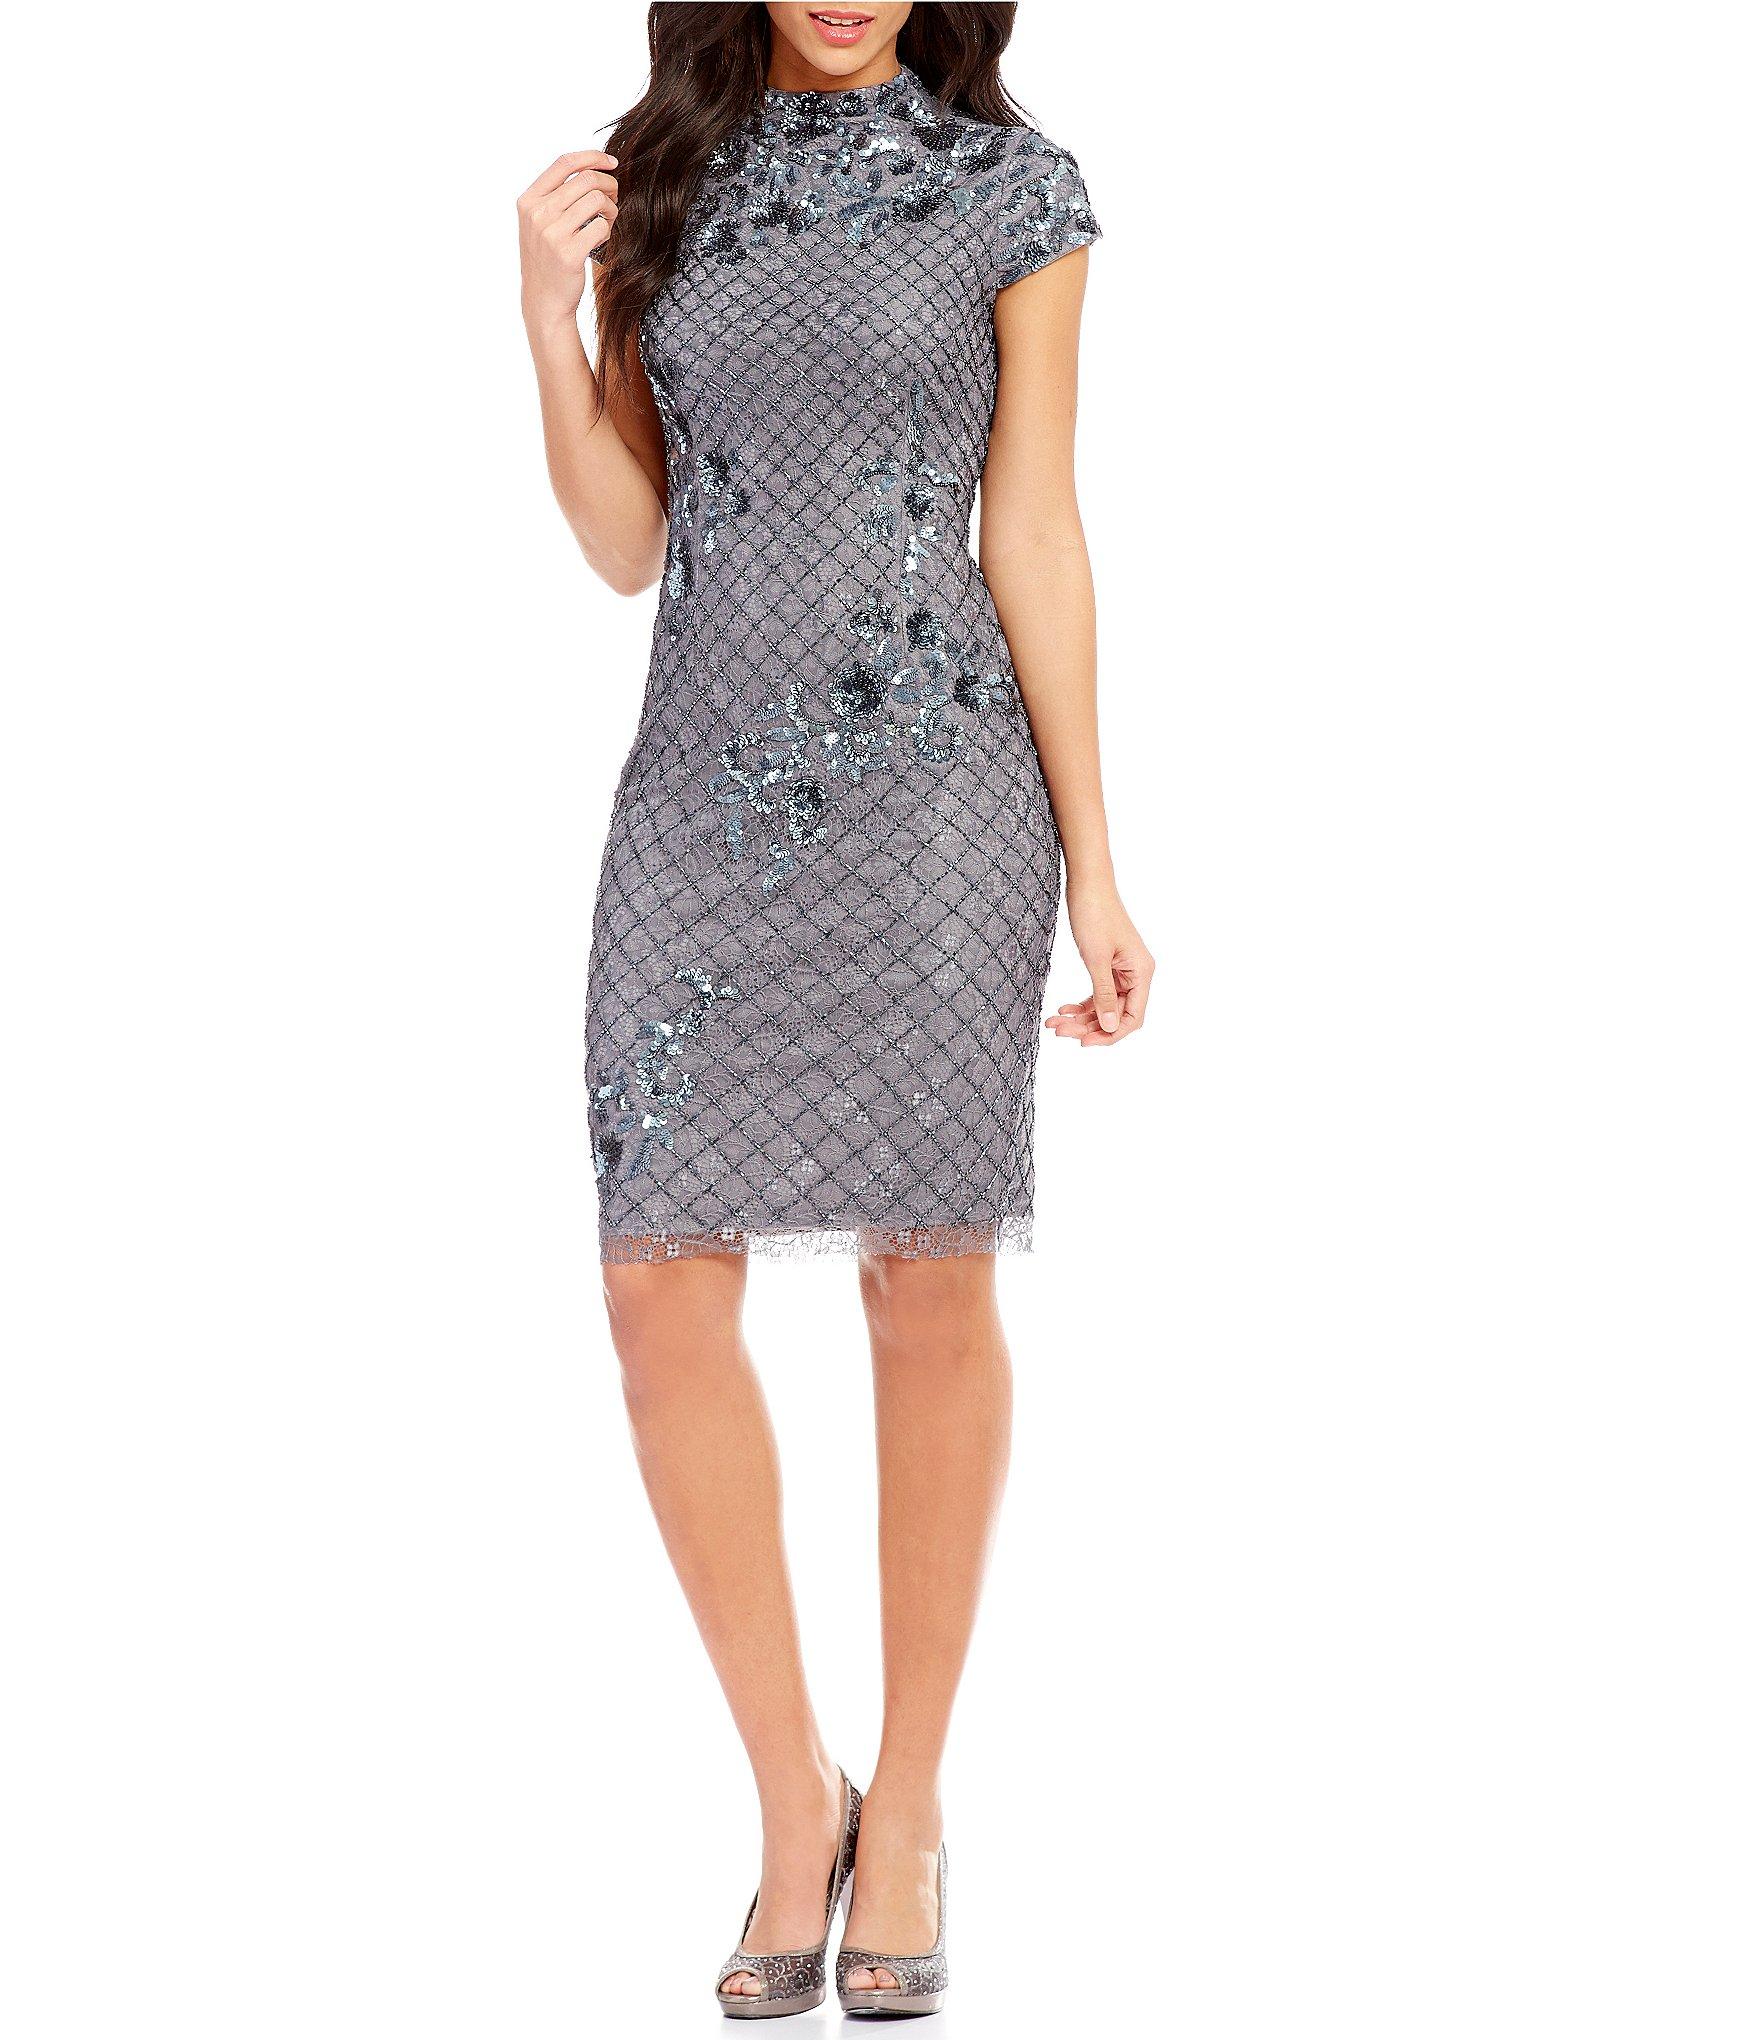 Adrianna Papell Women\'s Dresses & Gowns | Dillards